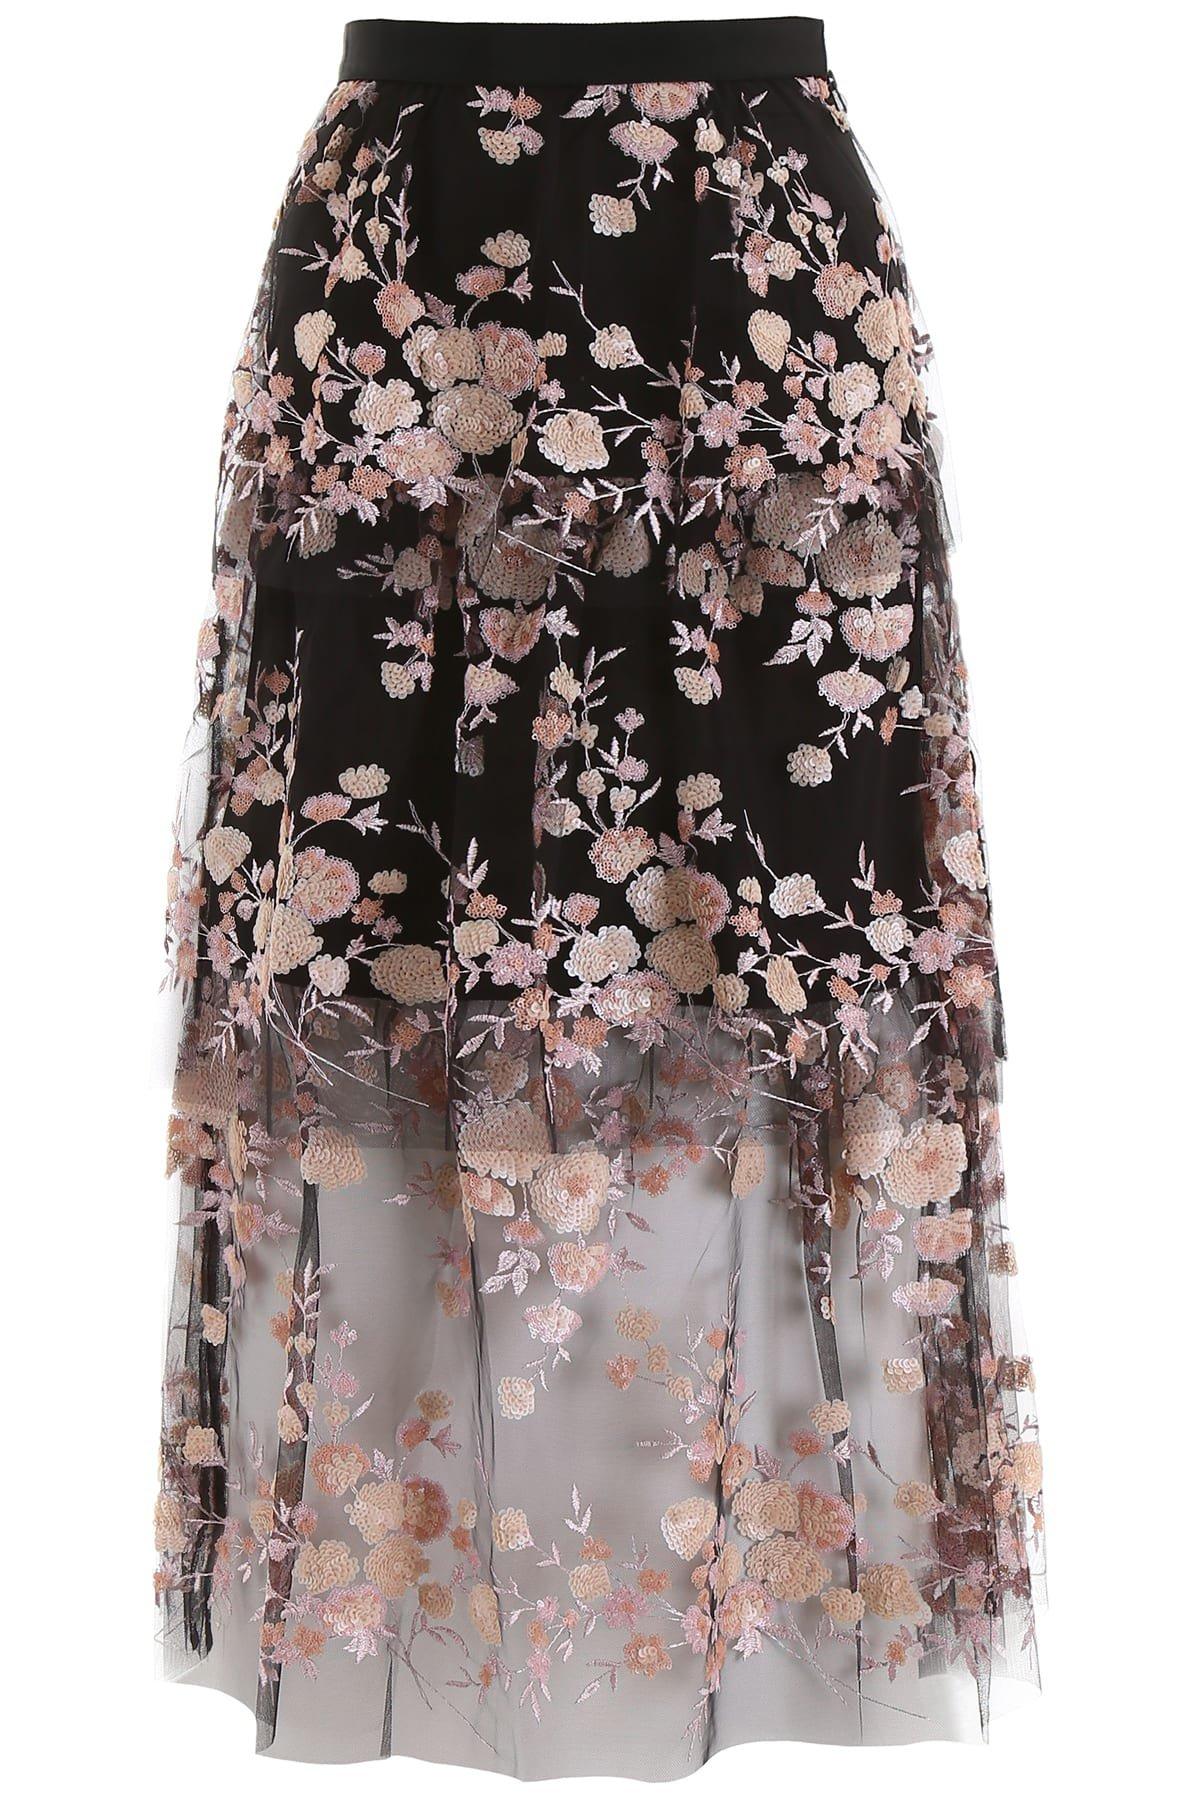 self-portrait Floral Mesh Skirt